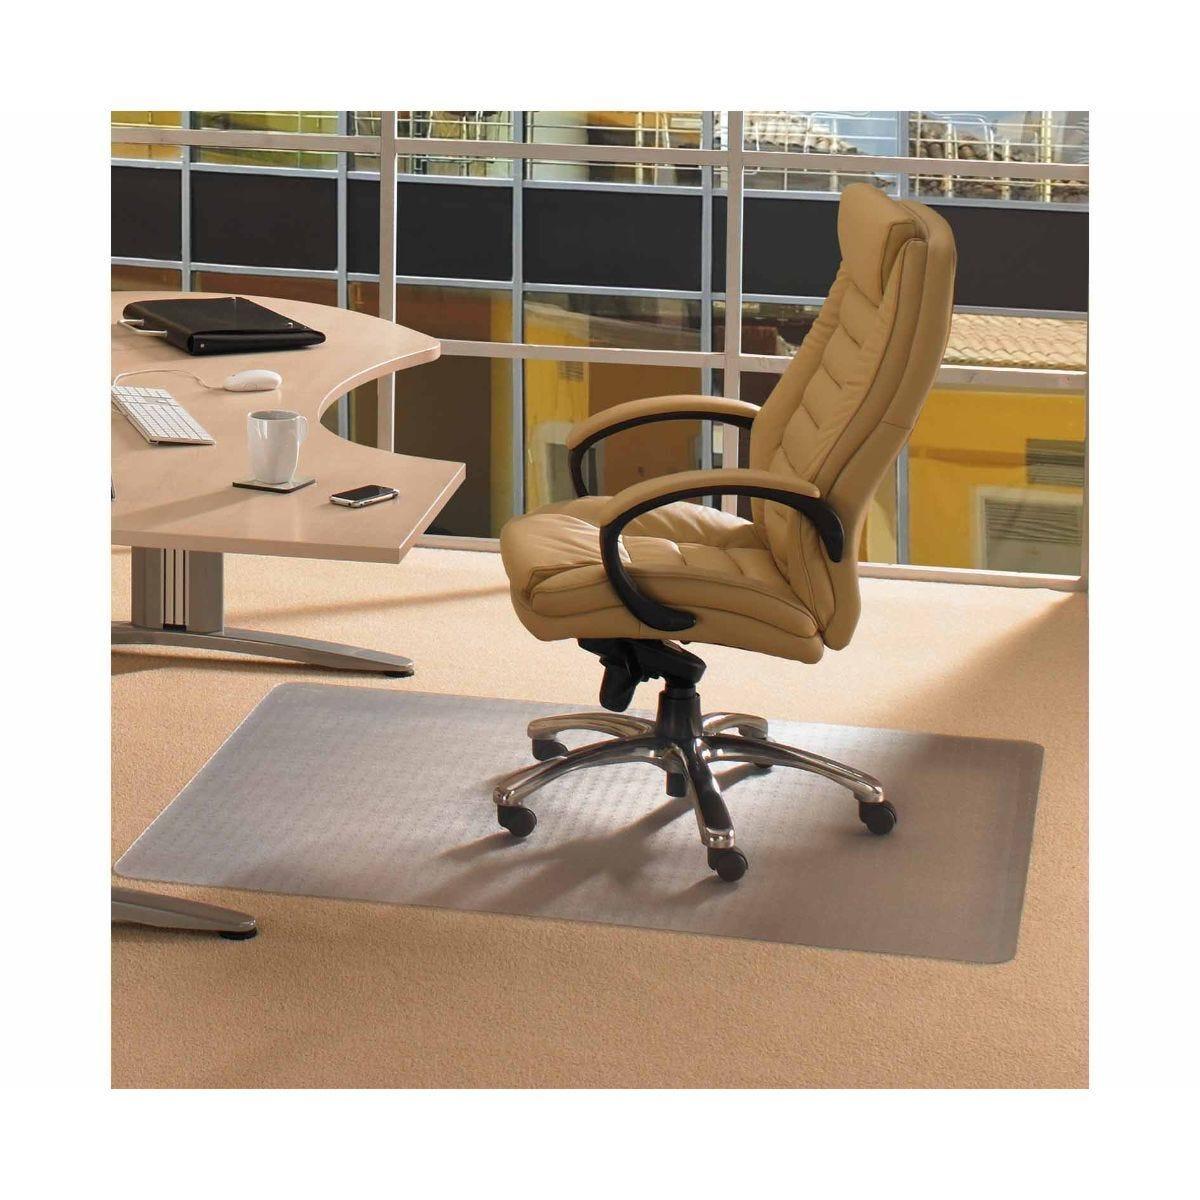 Cleartex Advantagemat Chair Mat for Low Pile Carpet Rectangular 120 x 300cm